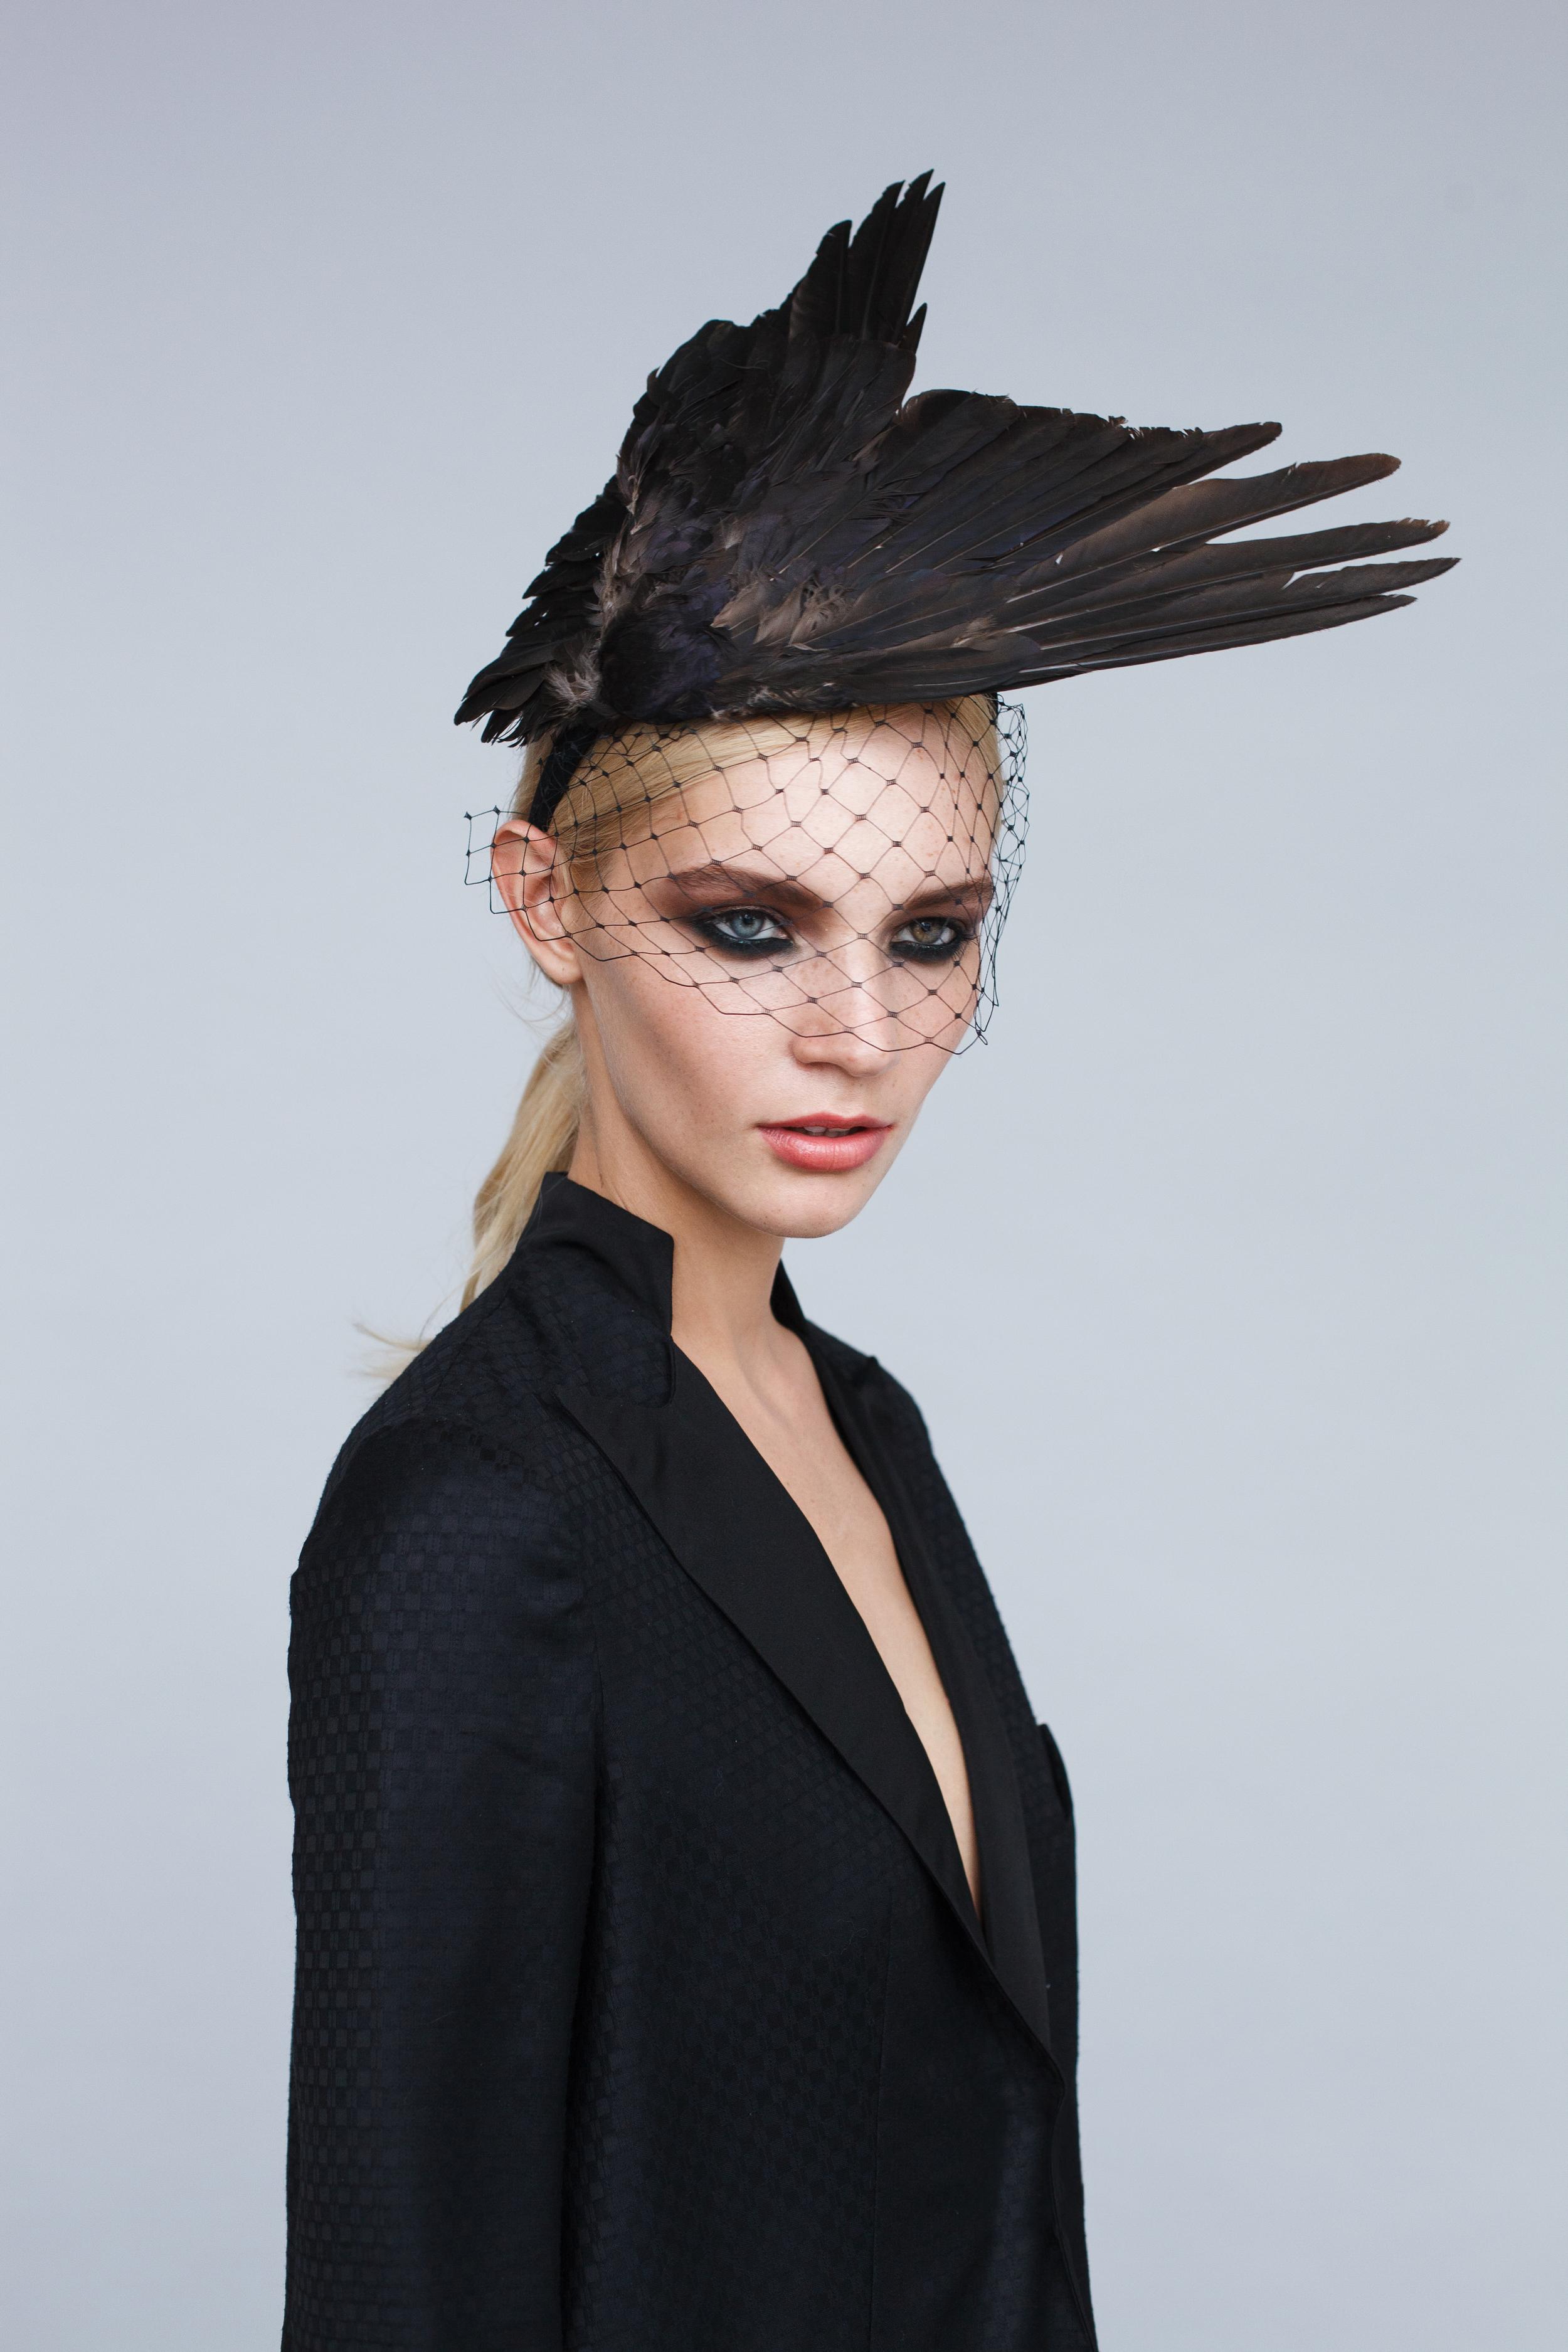 London Crow